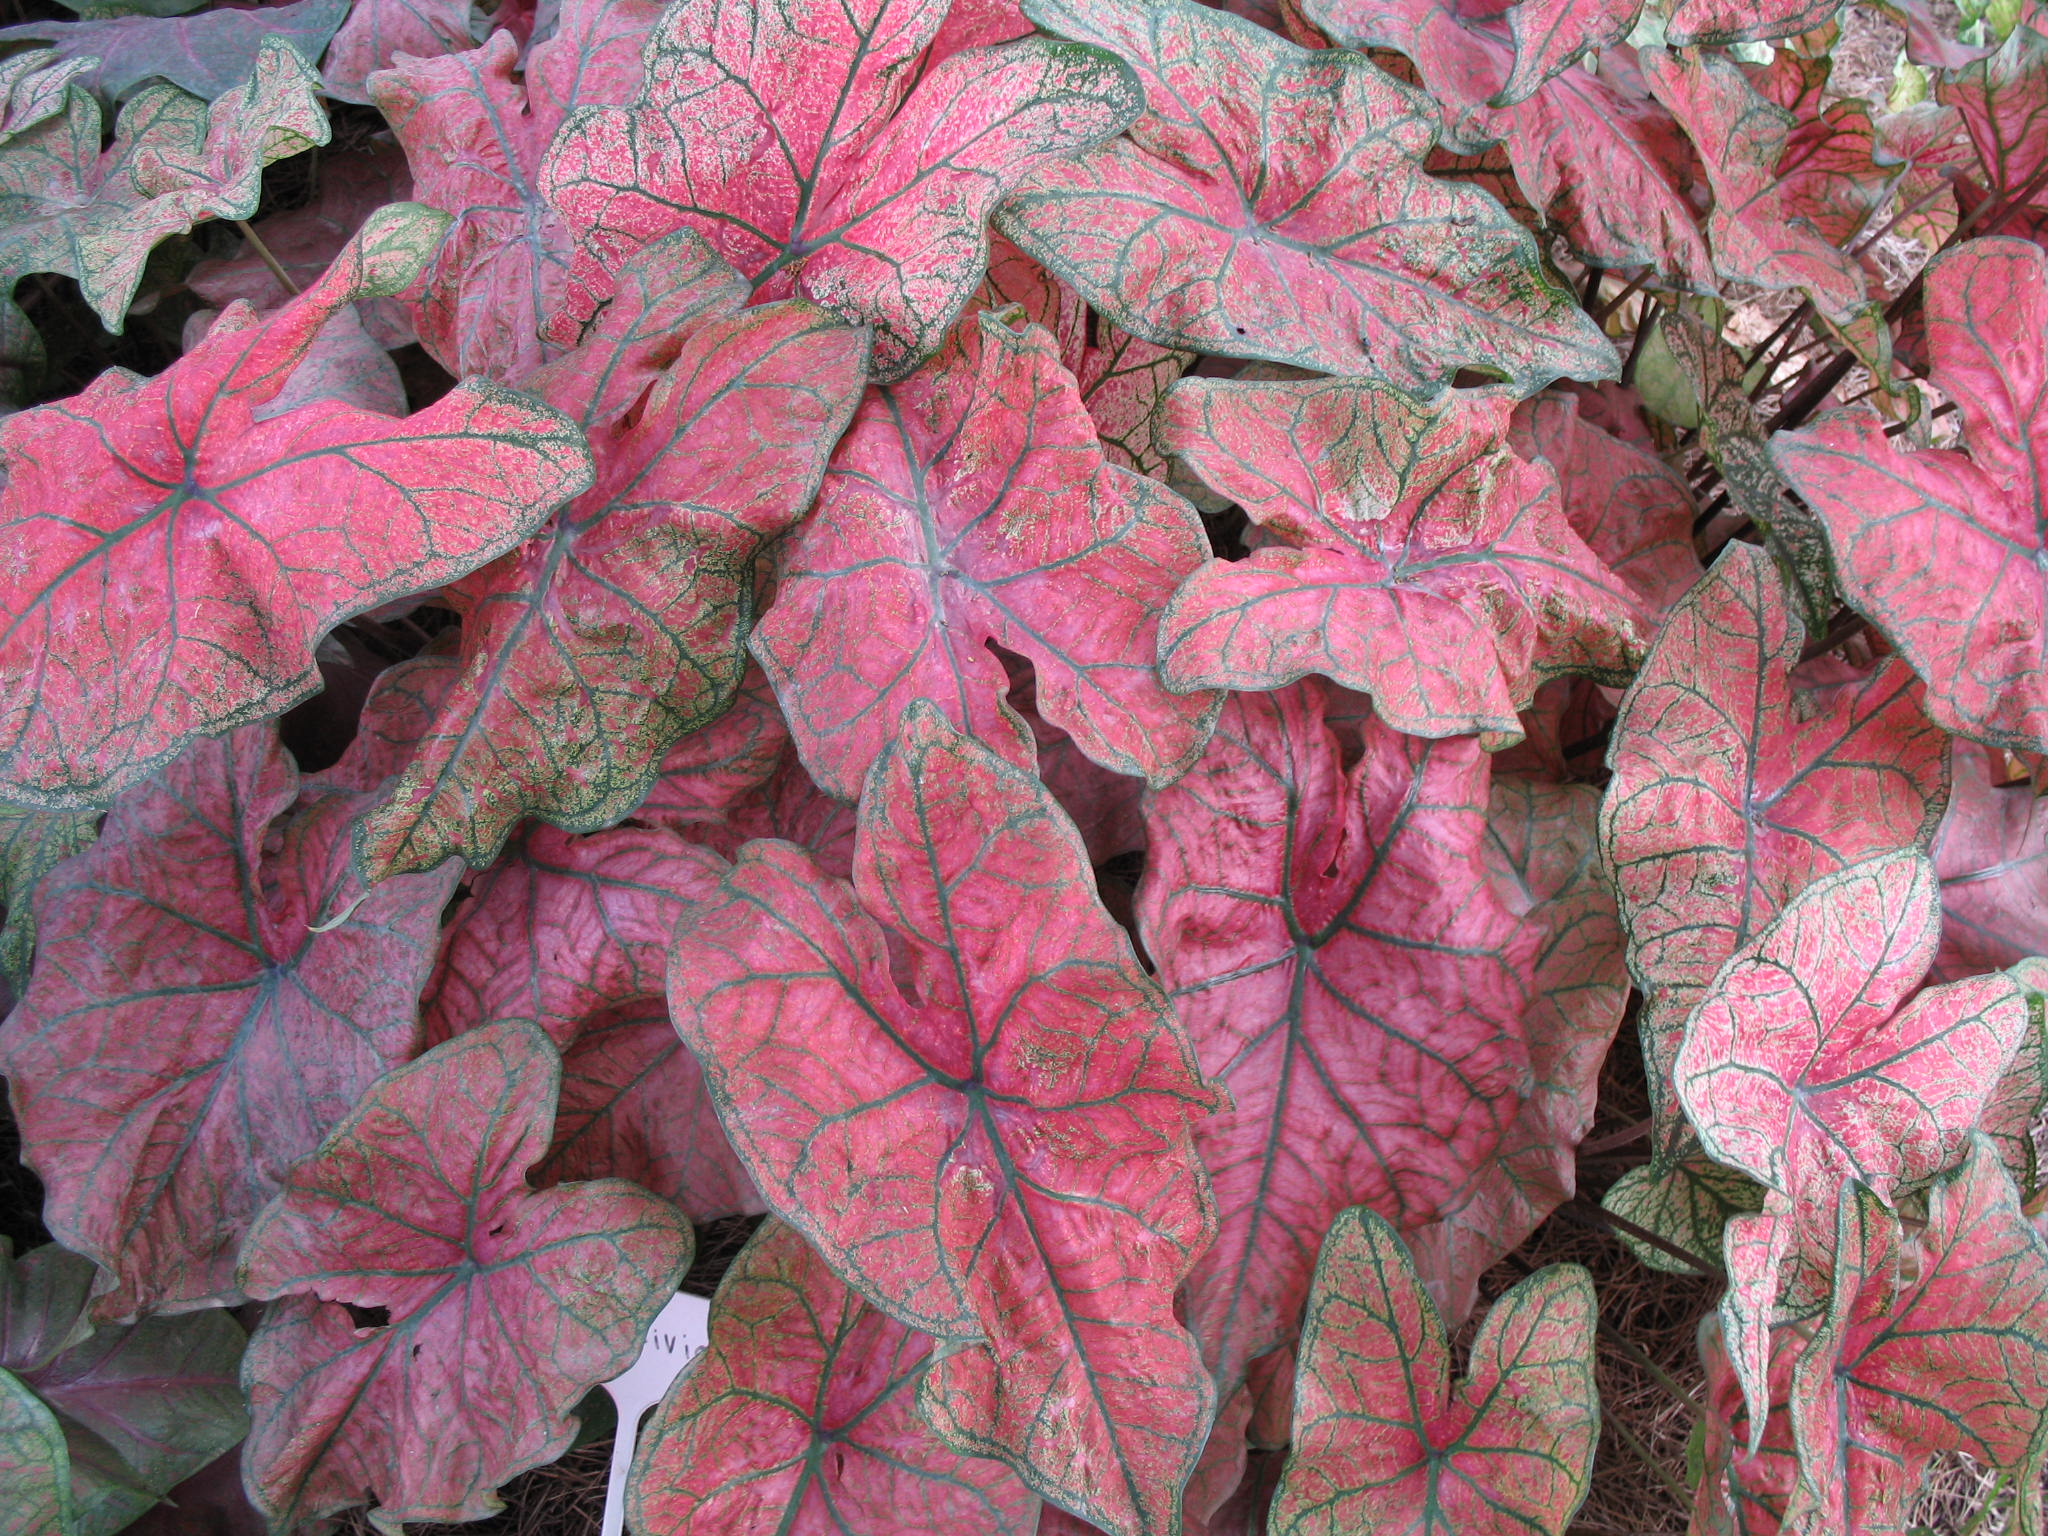 Caladium bicolor 'Festiva'   / Caladium bicolor 'Festiva'